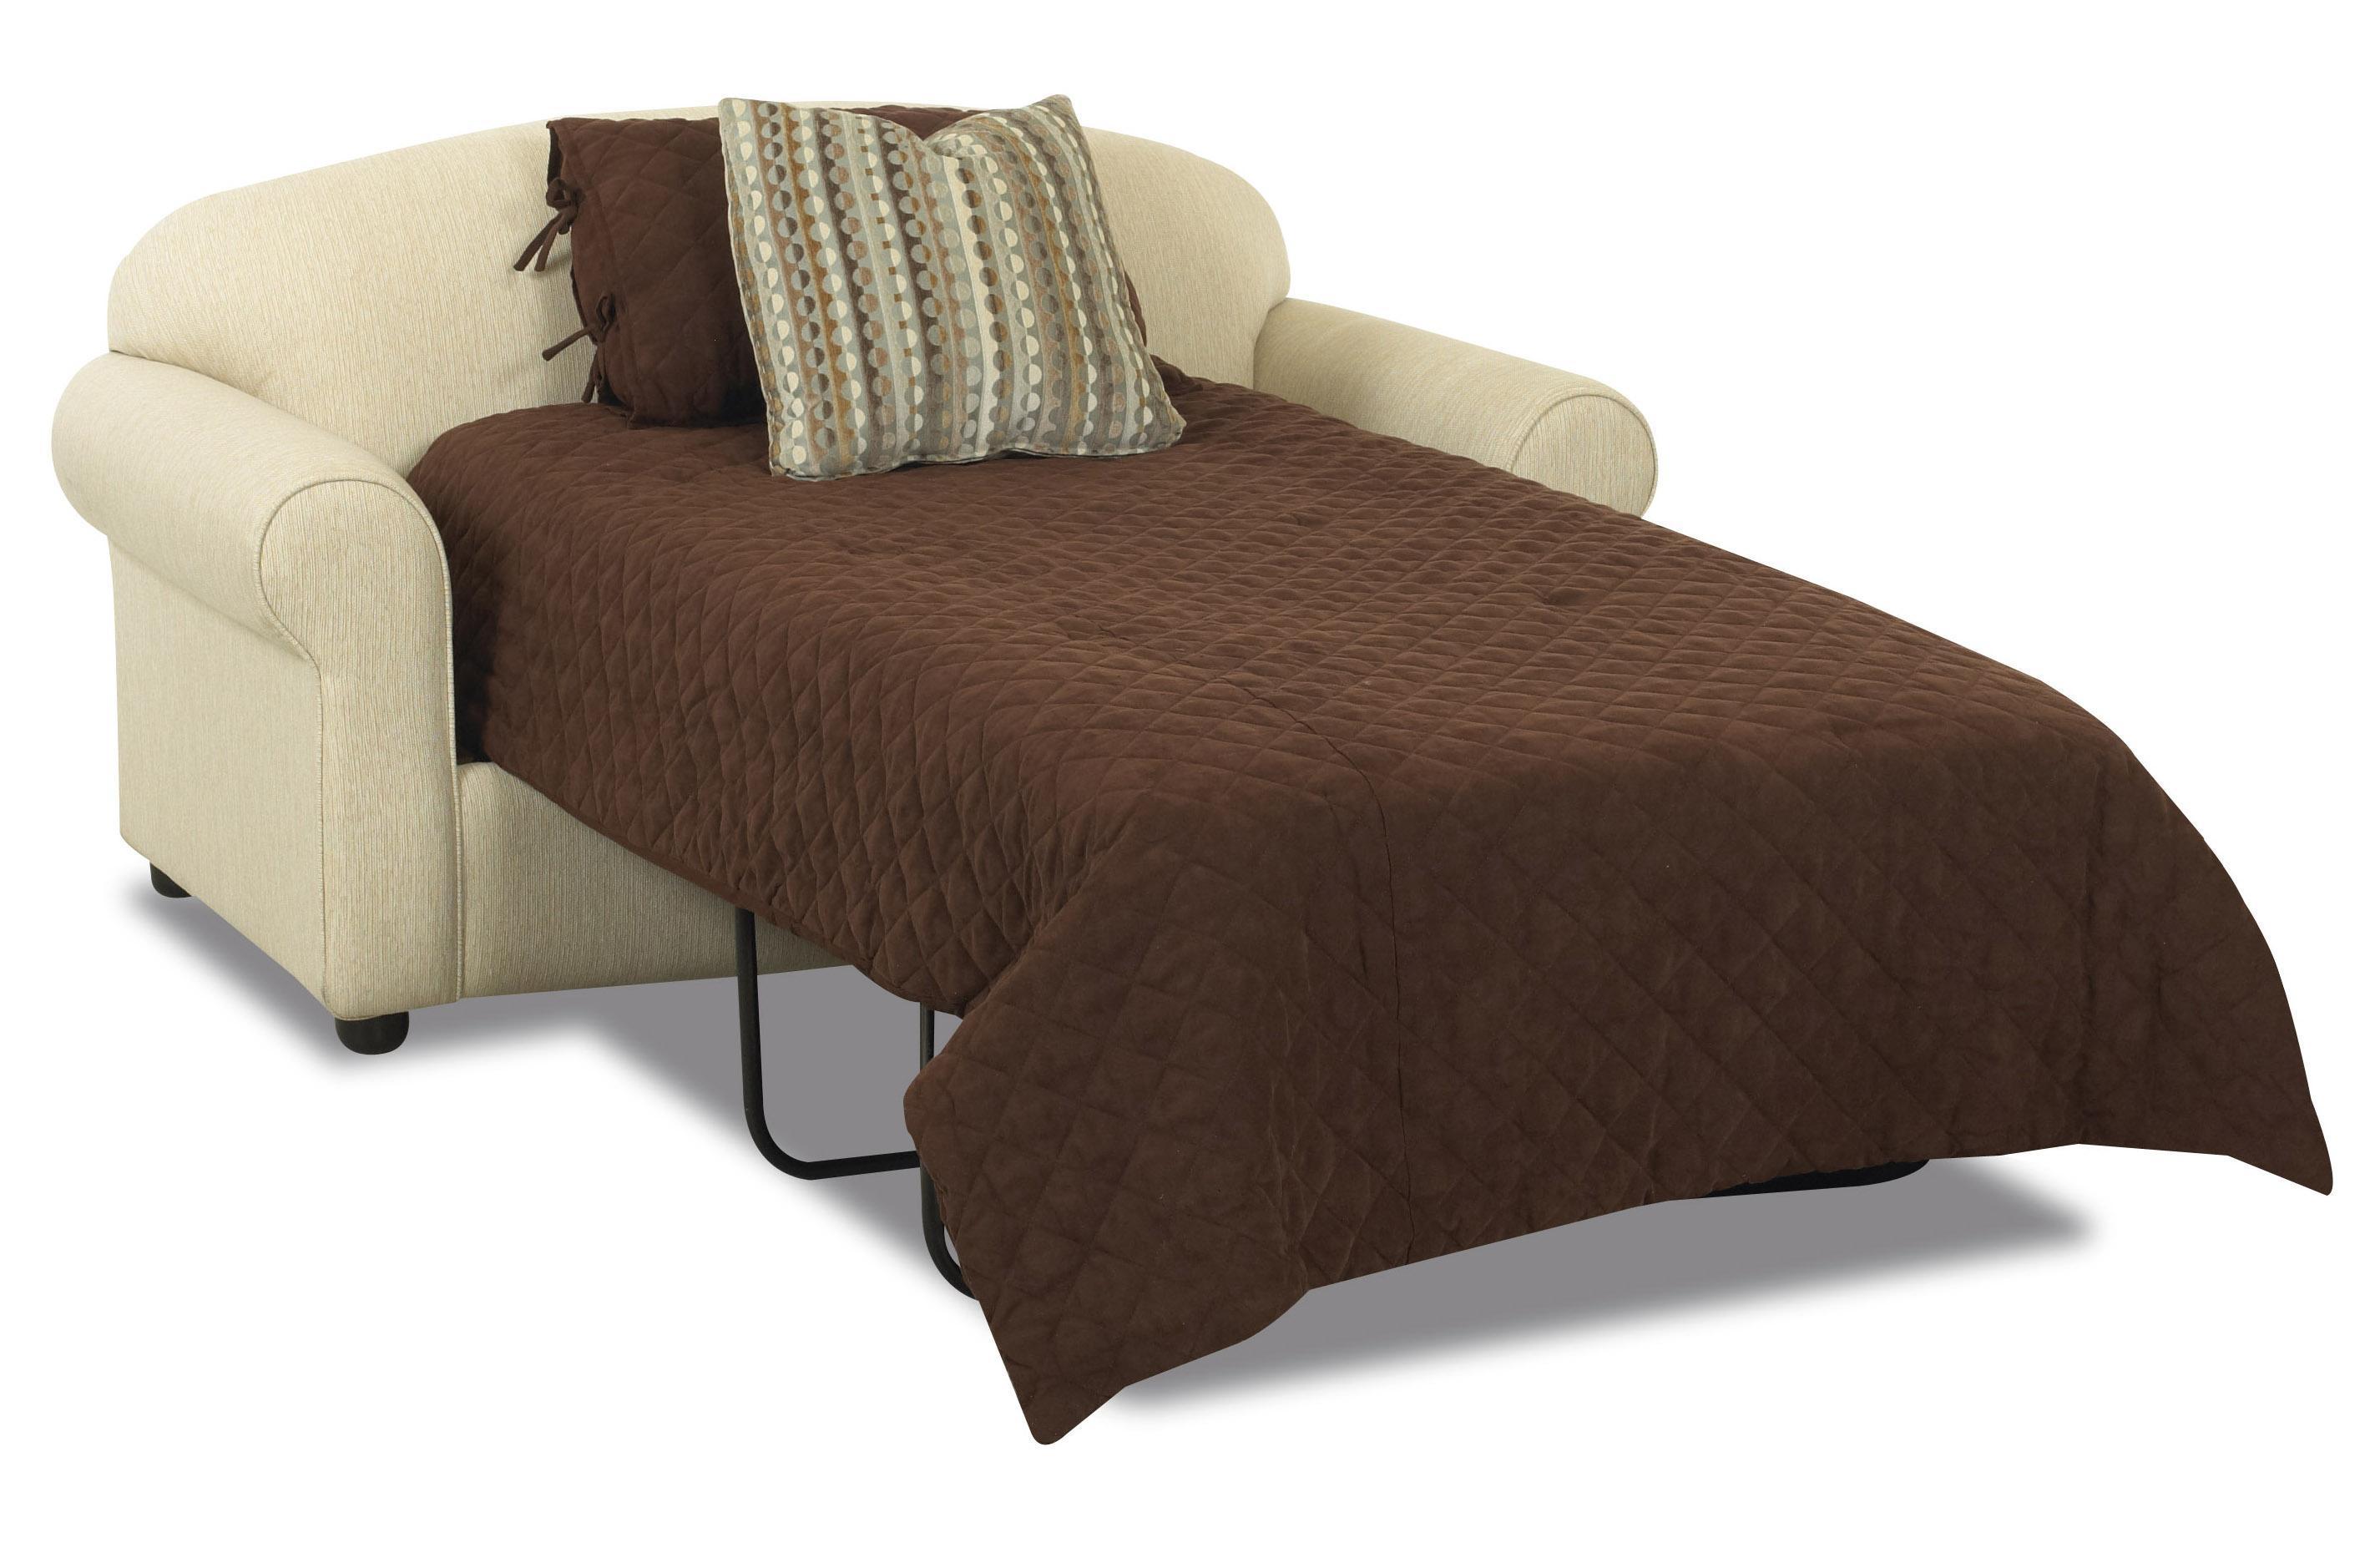 sheets for sofa bed green velvet sectional 20 photos sleeper ideas